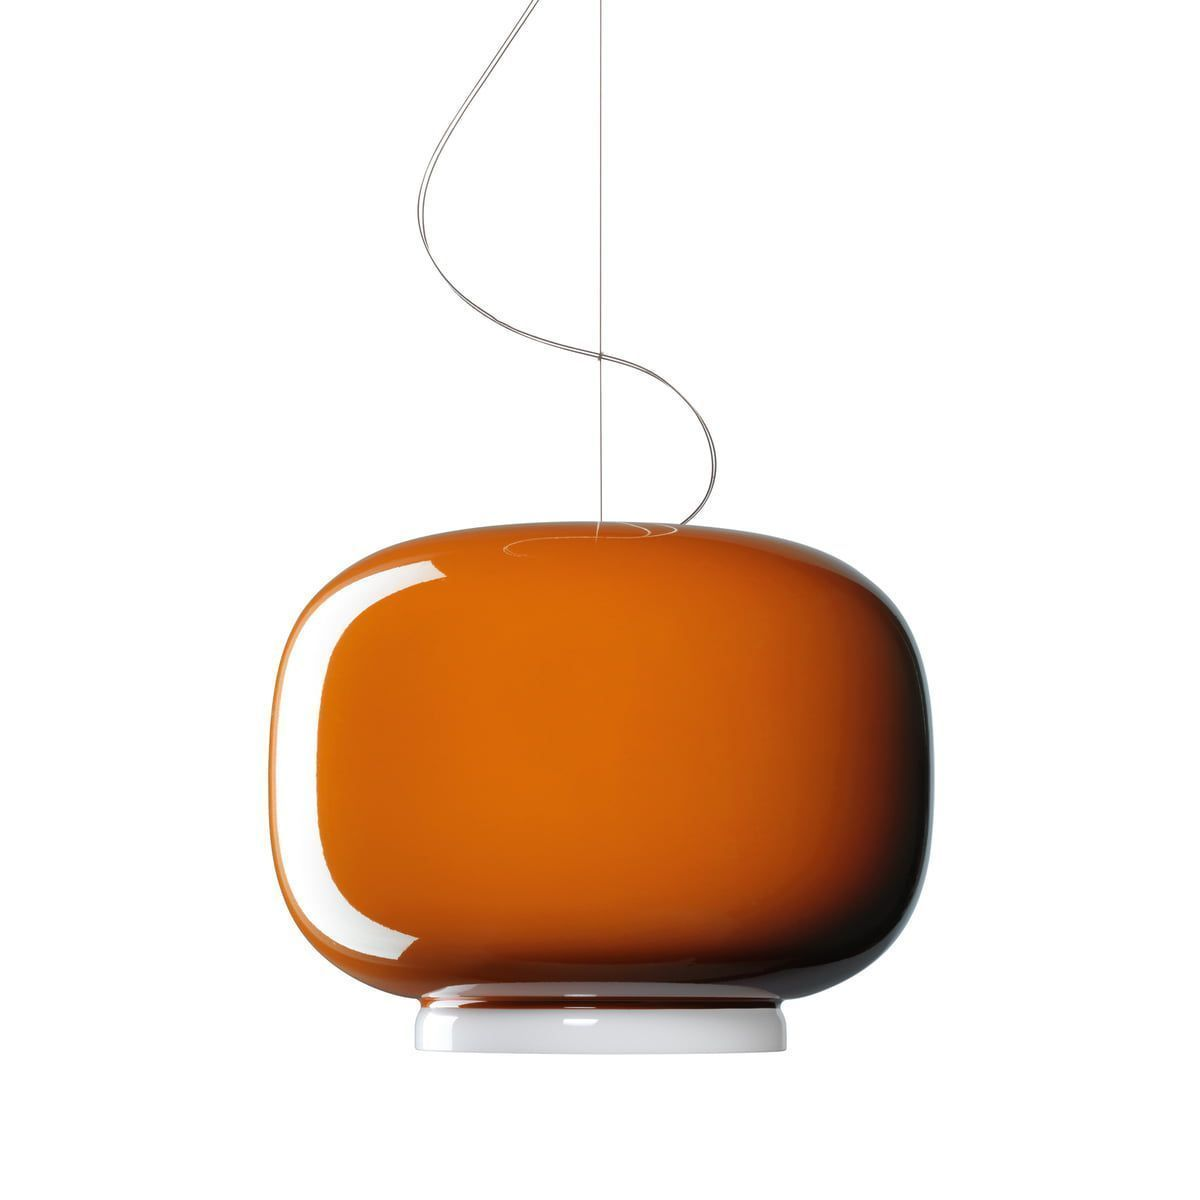 Lustra Luminaire Orange